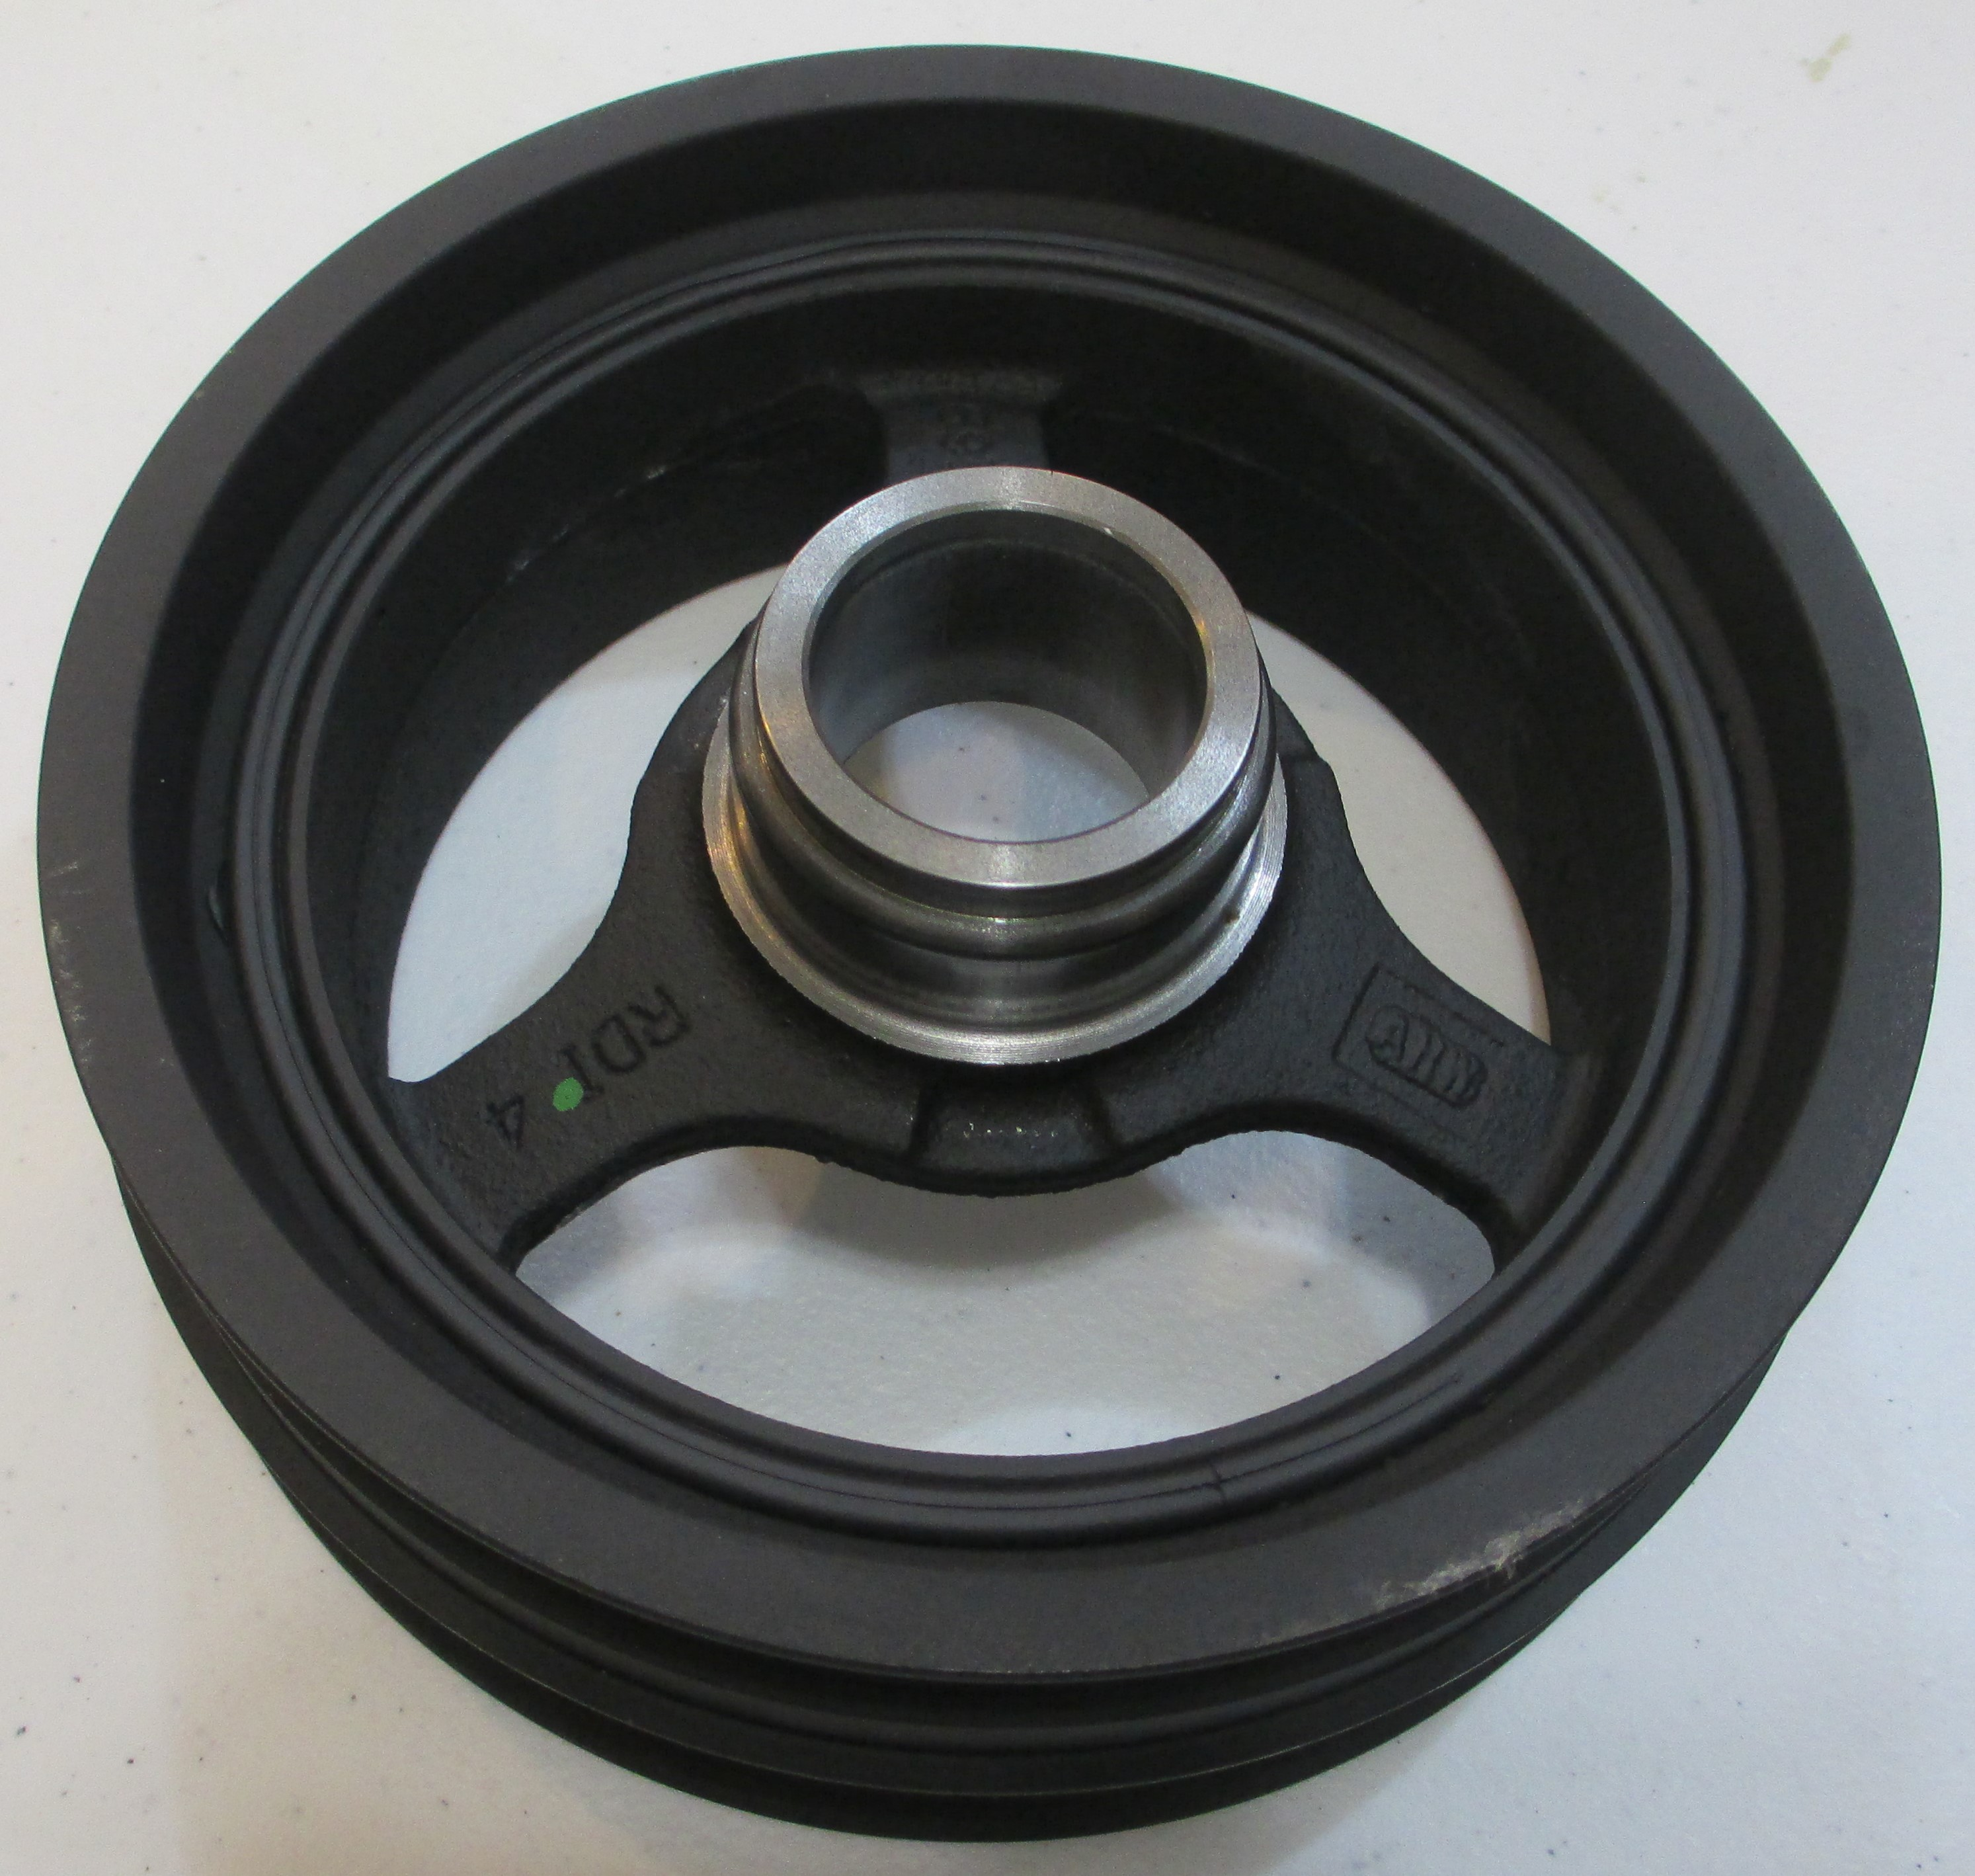 Ohio Speed Shops OSS-12674582 New Take-Off LS3 Harmonic Balancer